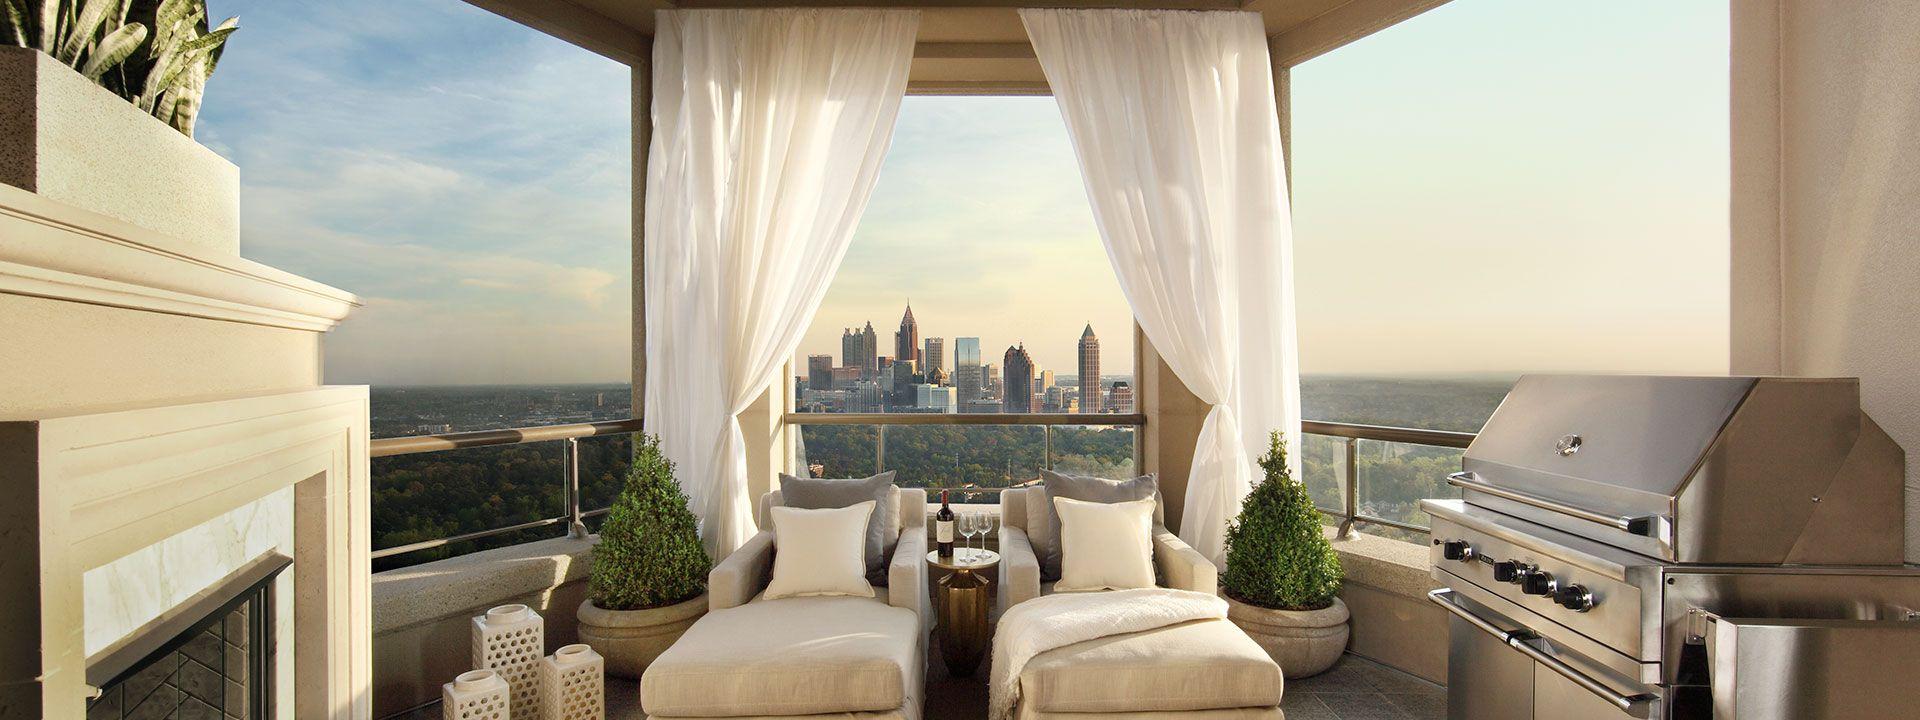 Buckhead Condos For Sale - Condo For Sale In Atlanta Ga | Mandarin ...